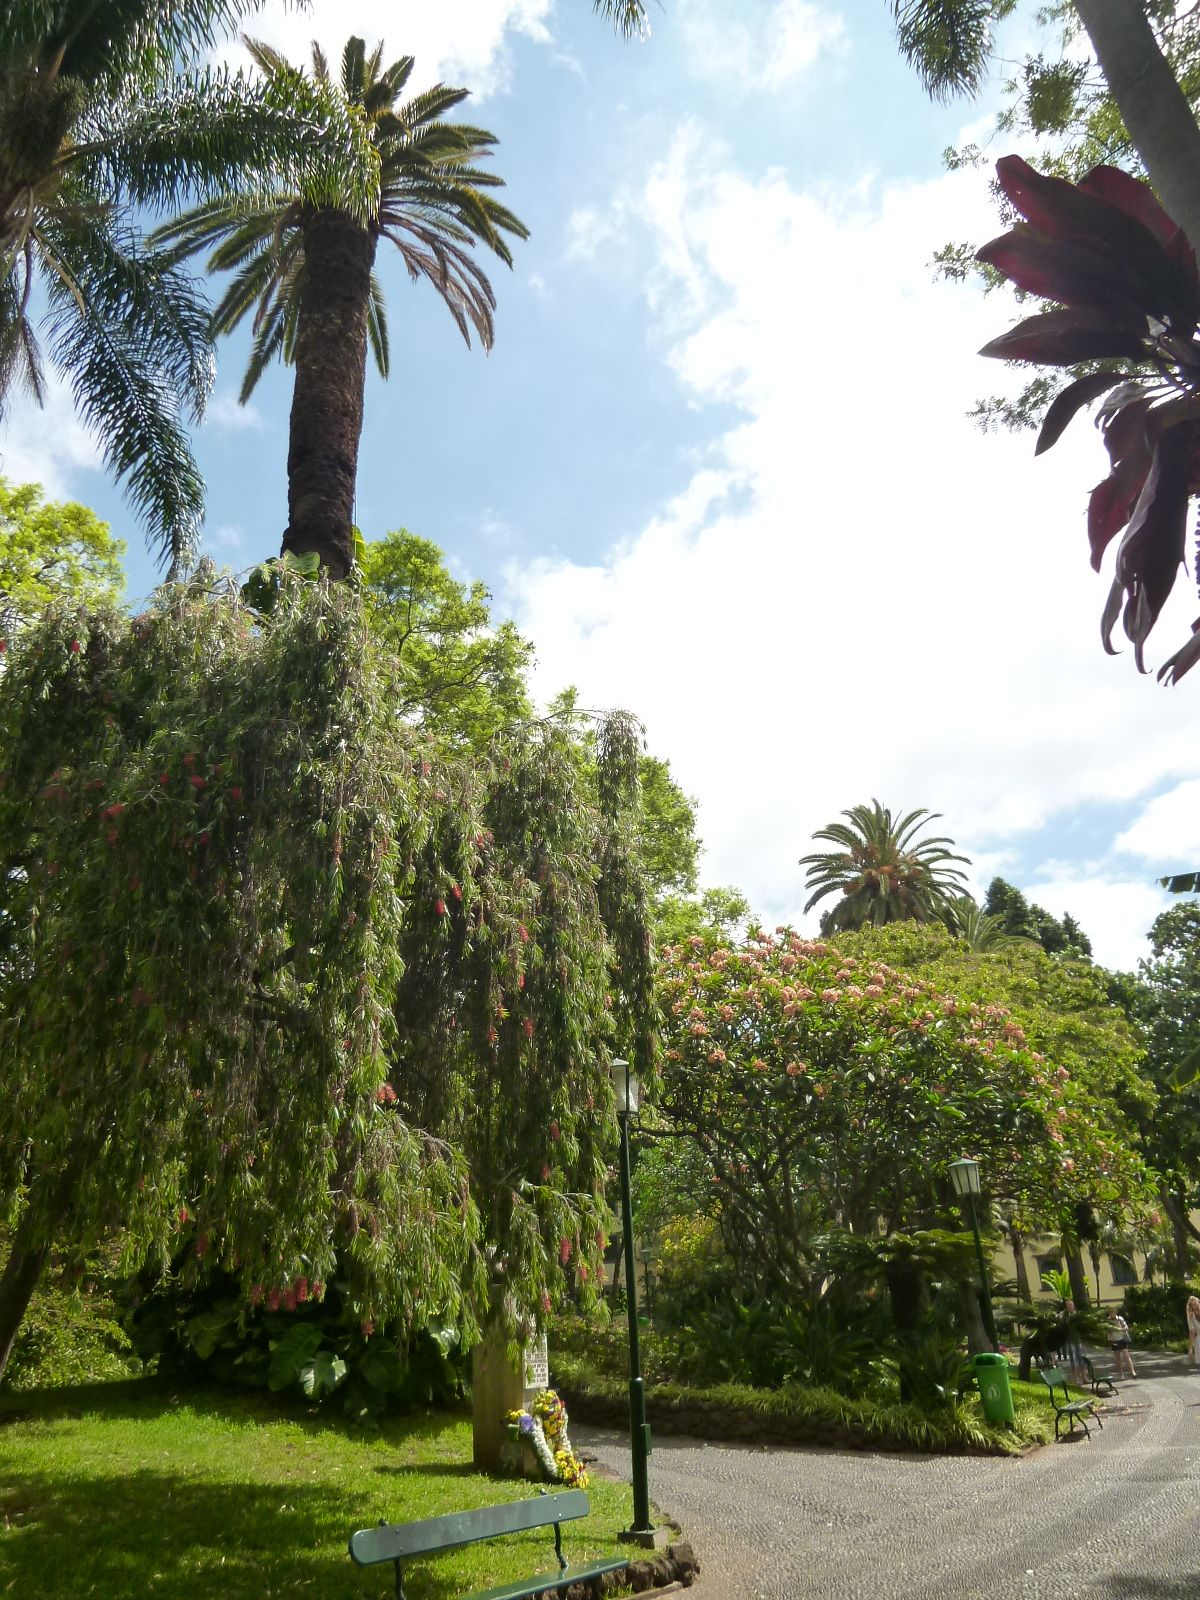 Jardim de Sao Francisco, Funchal Madeira Portugal (Luglio)